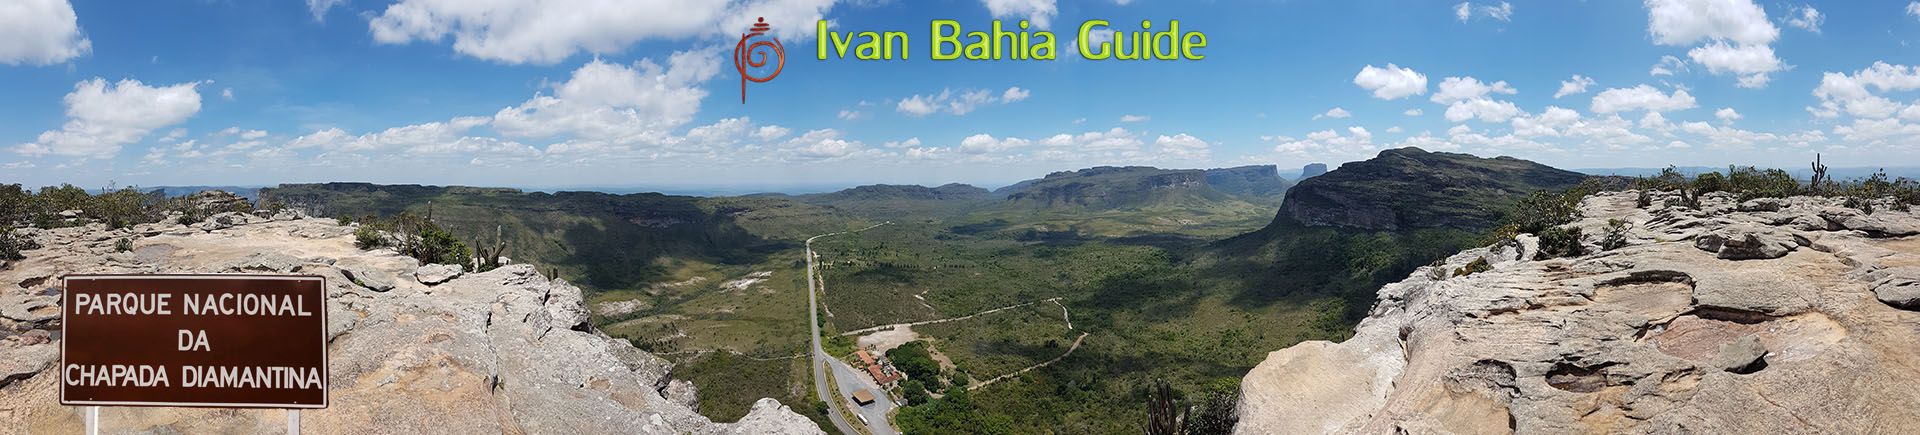 Ivan Bahia tour-guide / ballades en Chapada Diamantina Parc National (connu comme le 'Grand Canyon Brésilien') / #ibtg #ibg #ivanbahiaguide #ivanbahiatravelguide #zenturturismo #ivanchapadadiamantinaguide #valedopati #patyvalley #pati #viapati #valecapao #ivanchapadaguide #chapadadiamantinatransfer #chapadatrekking #chapadaroots #chapadasoul #lencoisbahia #chapadadiamantinatrekking #ivanchapadadiamantinaguide  #chapadadiamantinaguide  #guidechapadadiamantina #lencois #lençois #chapadaadventuredaniel #diamondmountains #zentur # #guiachapadadiamantina #chapadaaventure #discoverchapada #chapadadiamond #chapadasoul #diamantinatrip  #tripadvisor #bahiametisse, #fernandobingre, #ivansalvadorbahia #salvadorbahiaTravel #toursbylocals #fotosbahia #bahiafotos #chapadadiamantinanationalpark #yourtoursbrazil #maurotours #bahiatopturismo #bahiapremium #maisbahiaturismo #fernandobingretourguide #cassiturismo